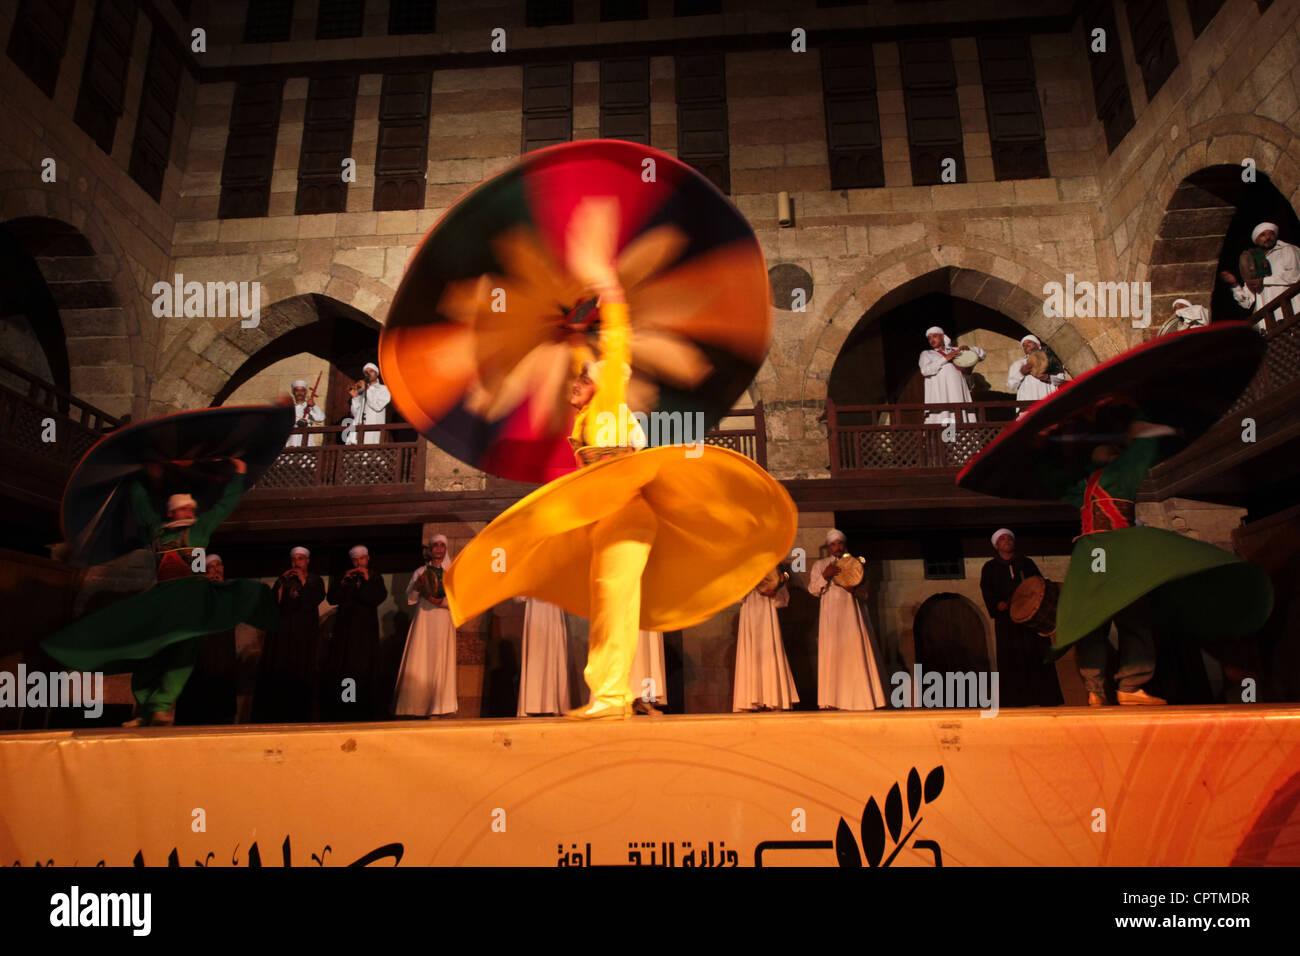 TRADITIONAL Sufi DANCE TANORAH DANCING, CAIRO, EGYPT - Stock Image